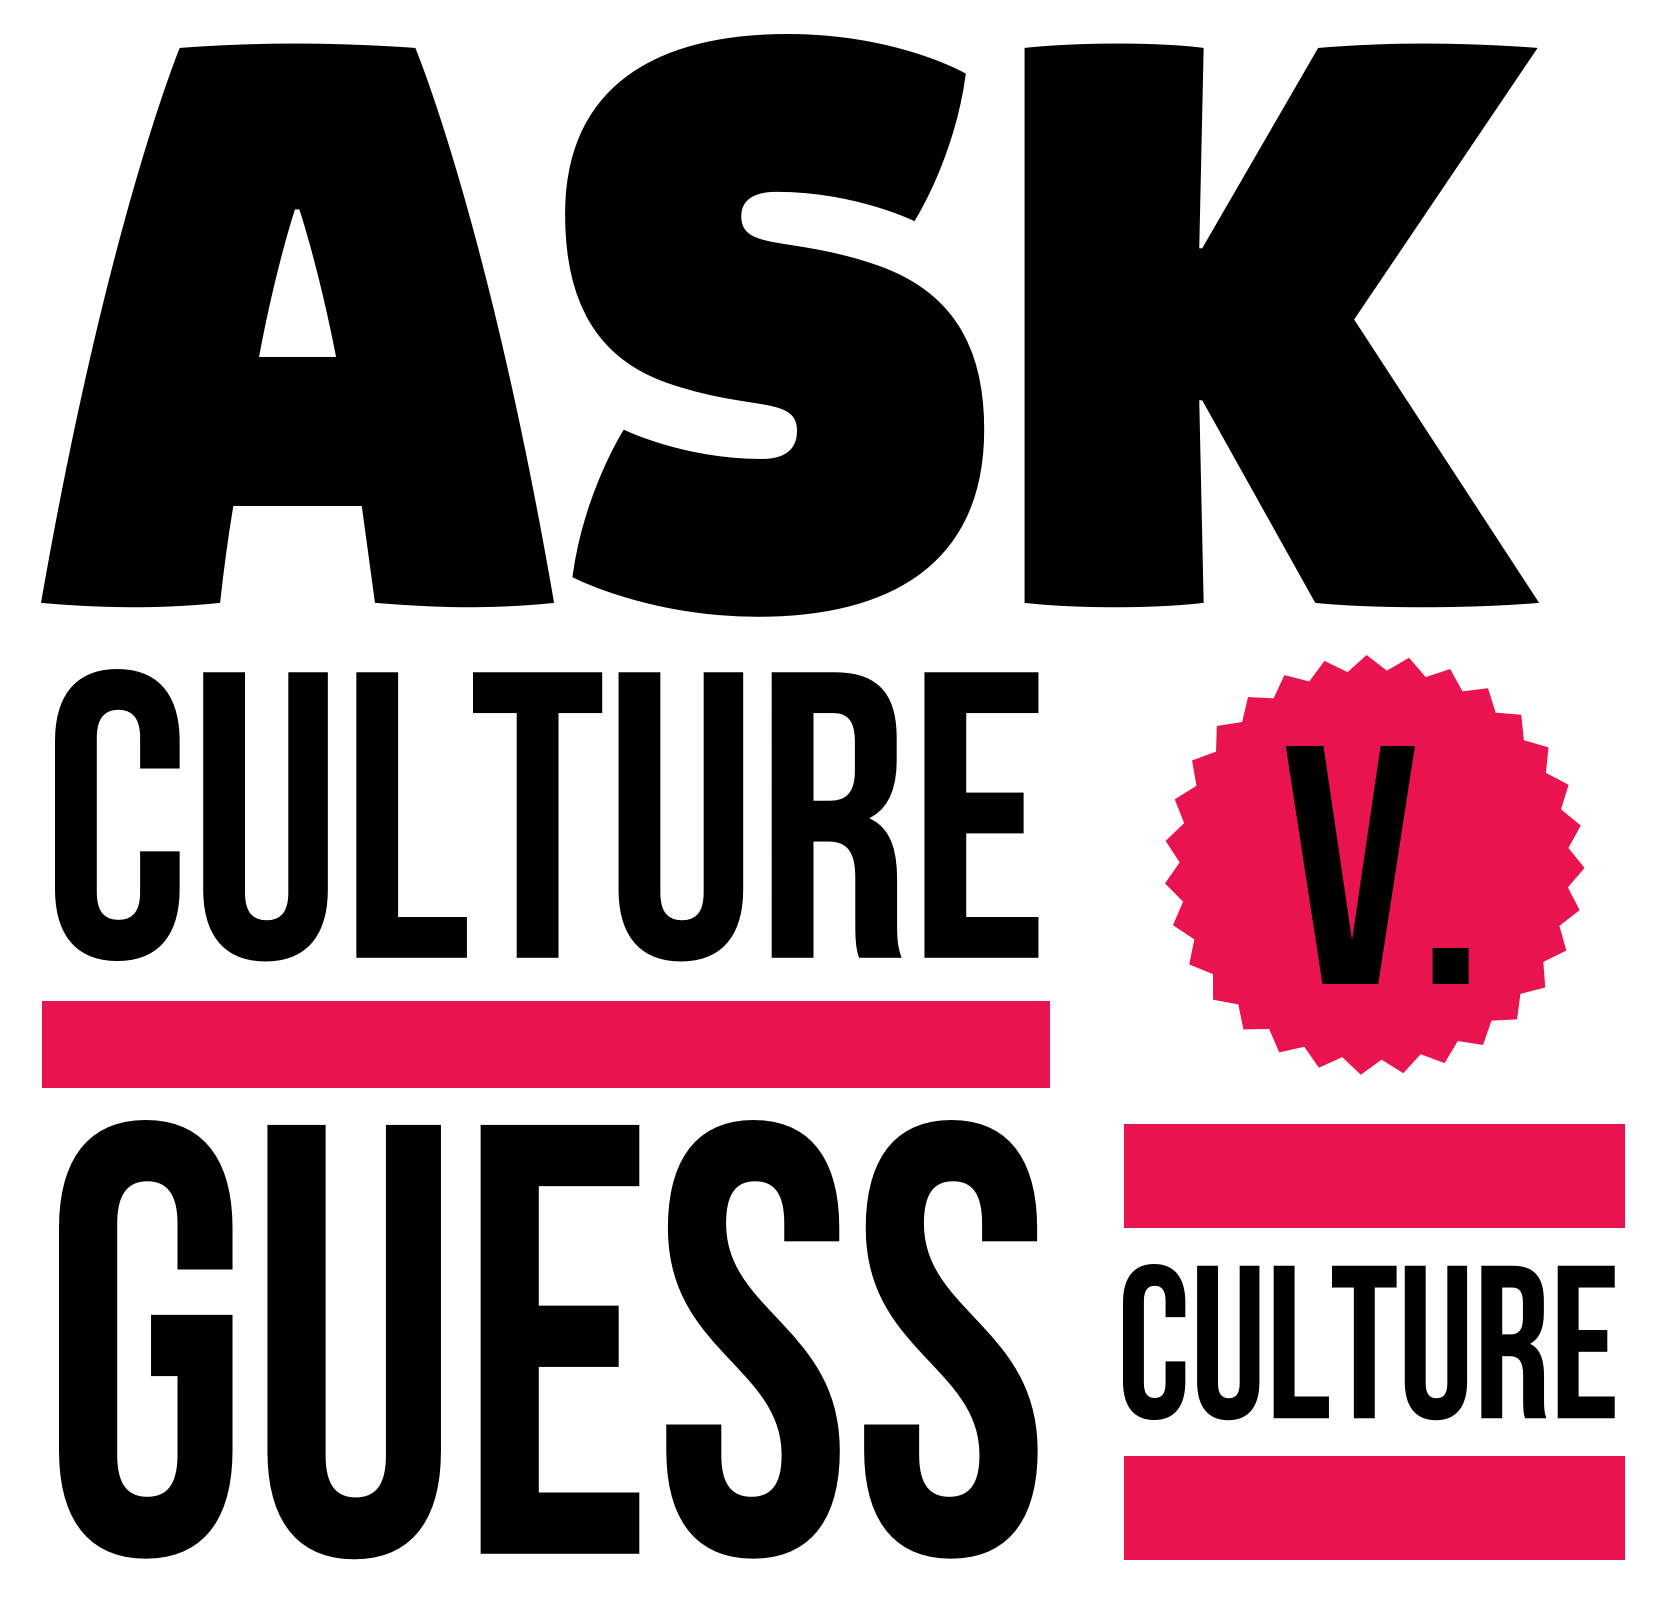 The words: Ask Culture V. Guess Culture